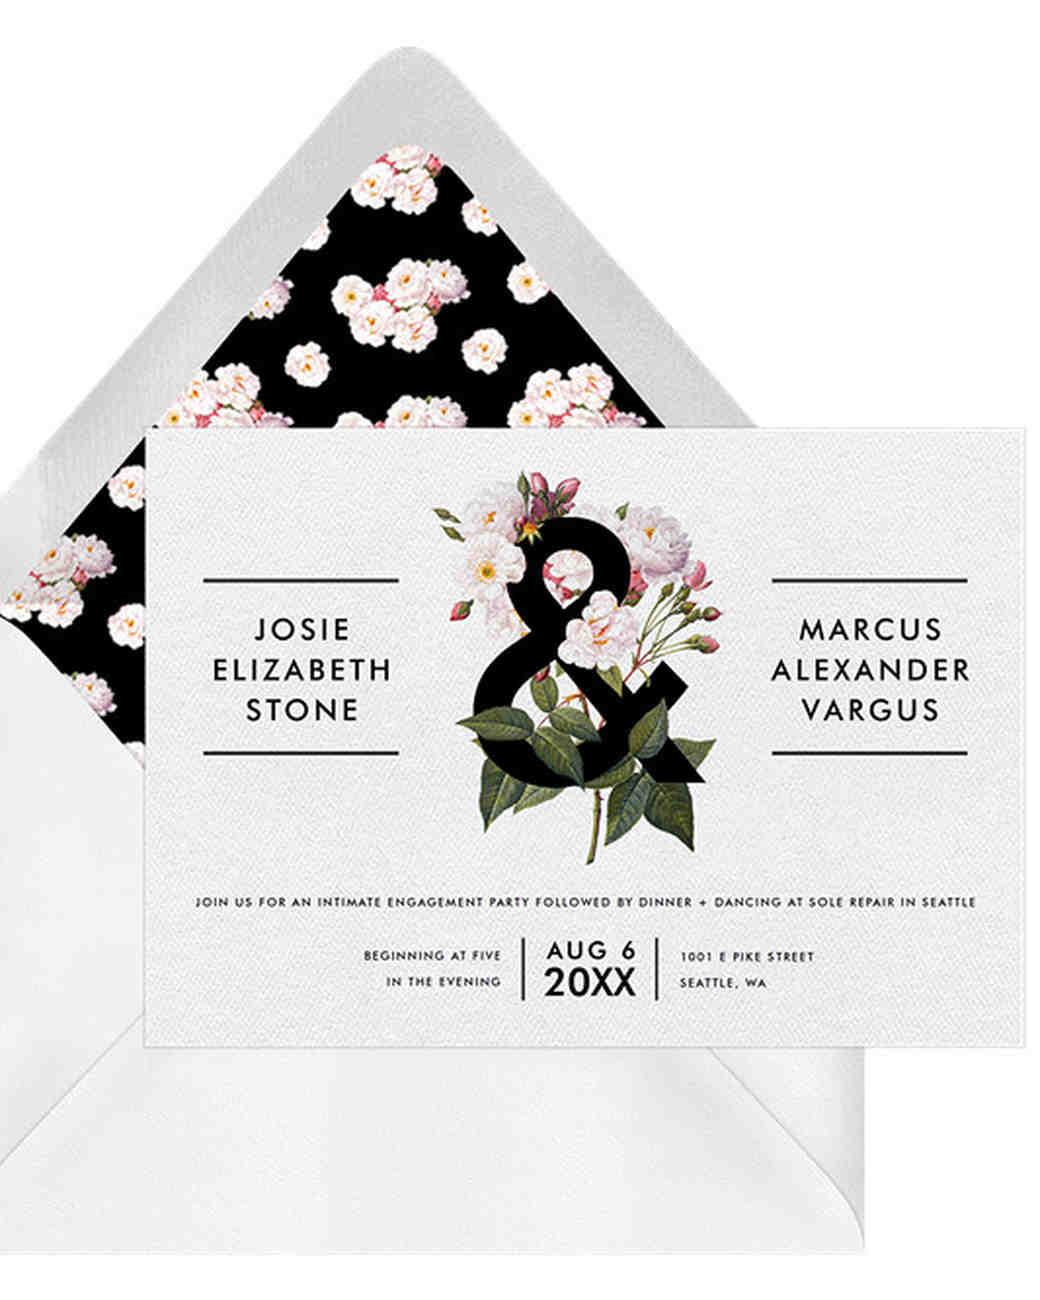 https://www.marthastewartweddings.com/600430/paperless-engagement-party-invitations